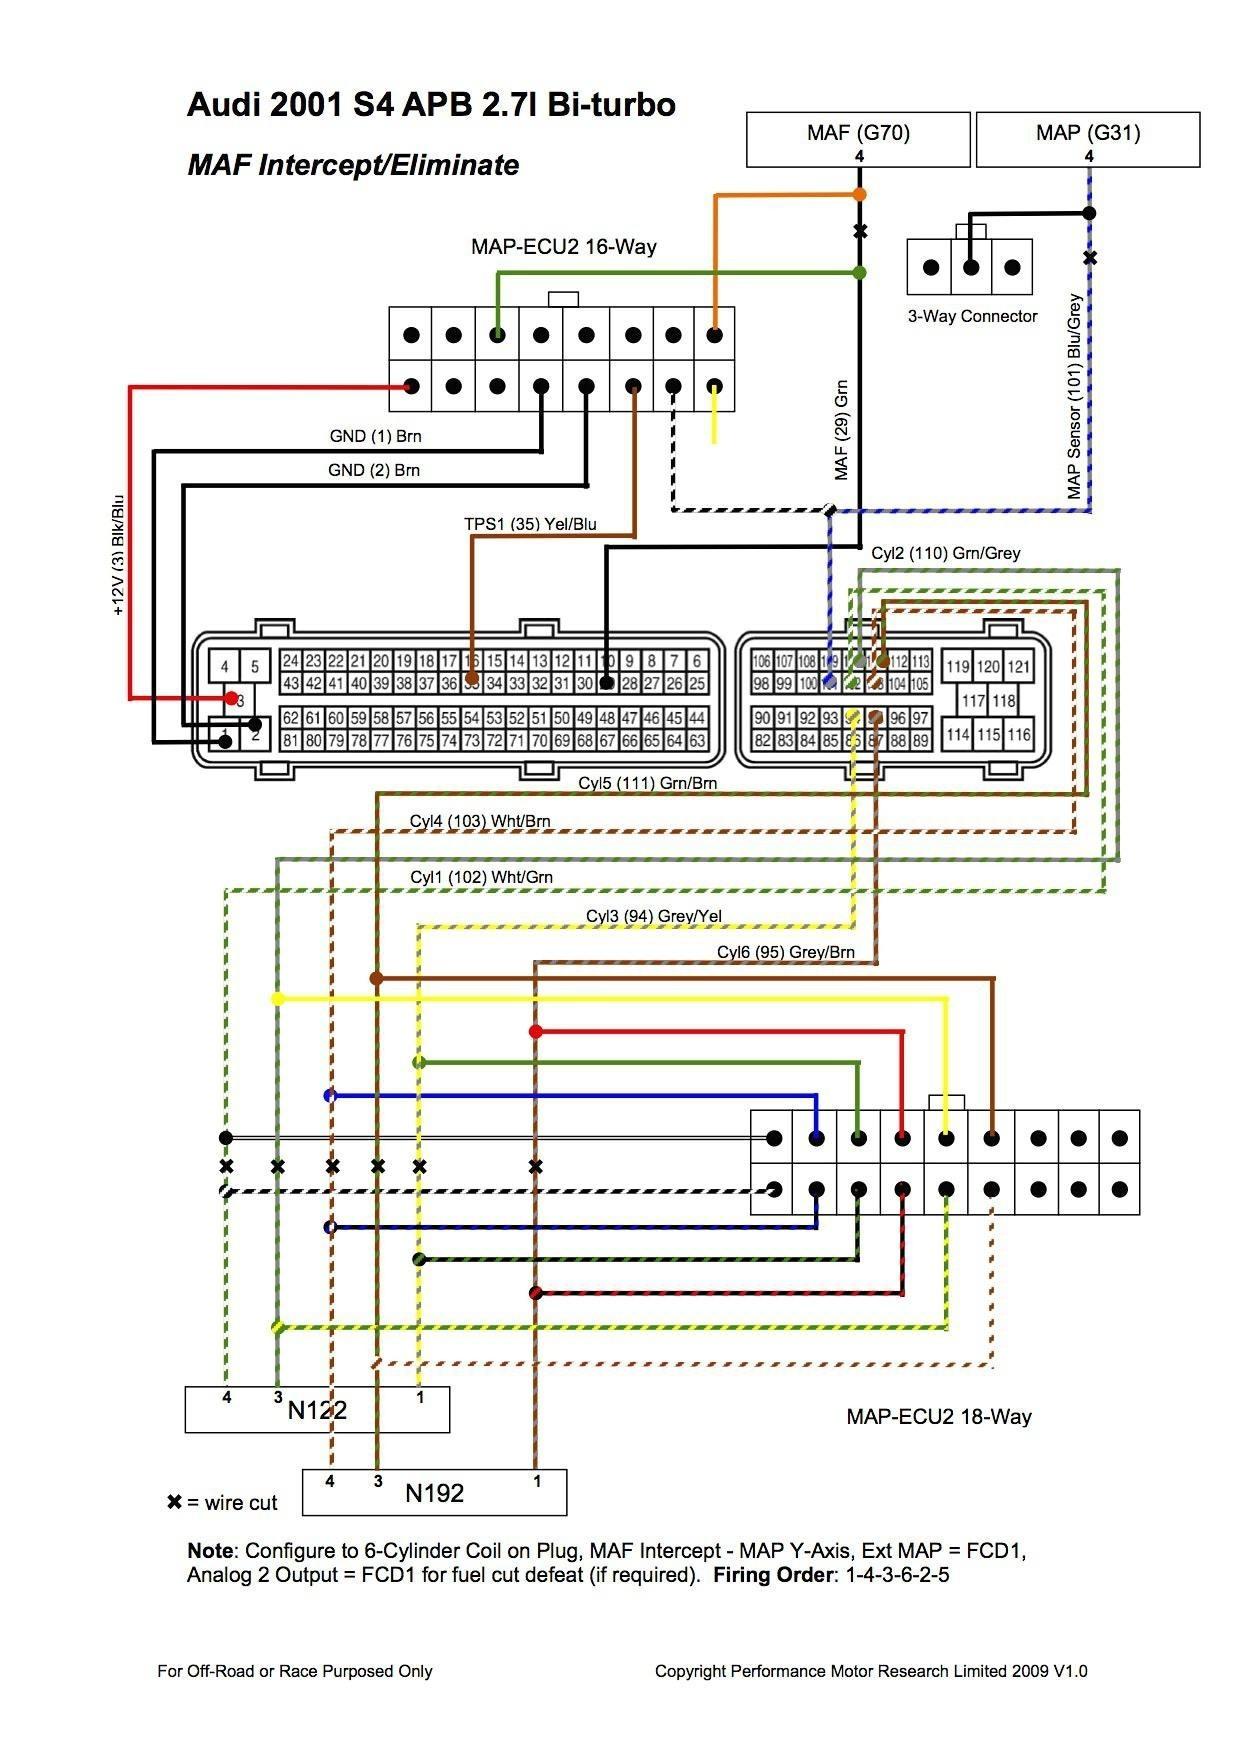 Wiring Diagram 2001 Kia Rio 1979 Chevy Truck Fuse Box Diagram For Wiring Diagram Schematics